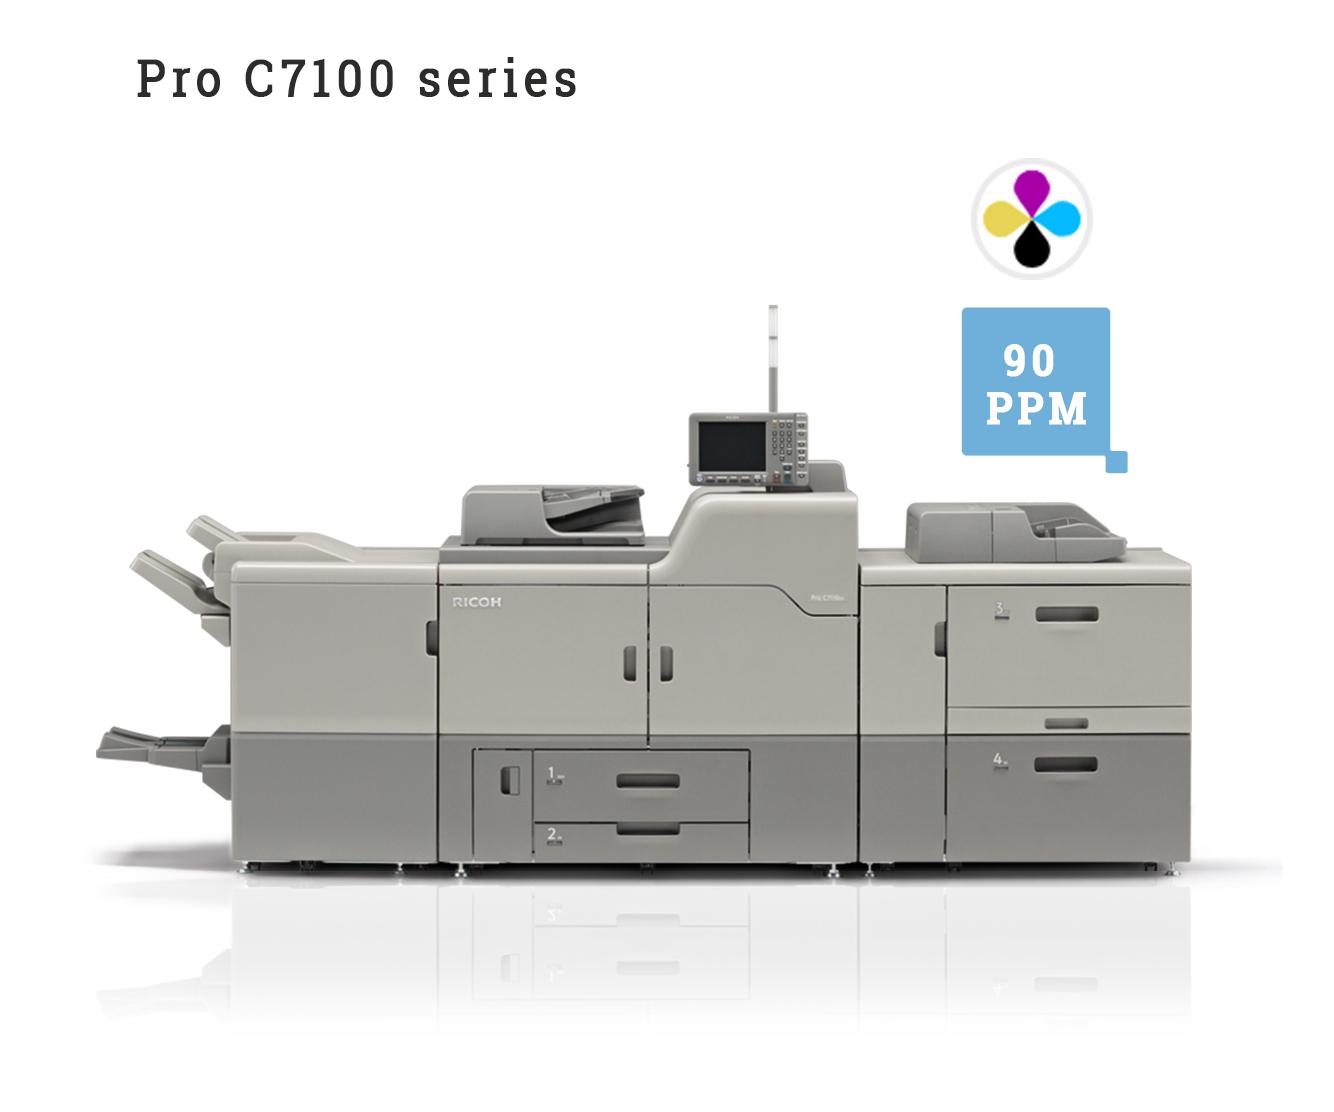 proc7100series